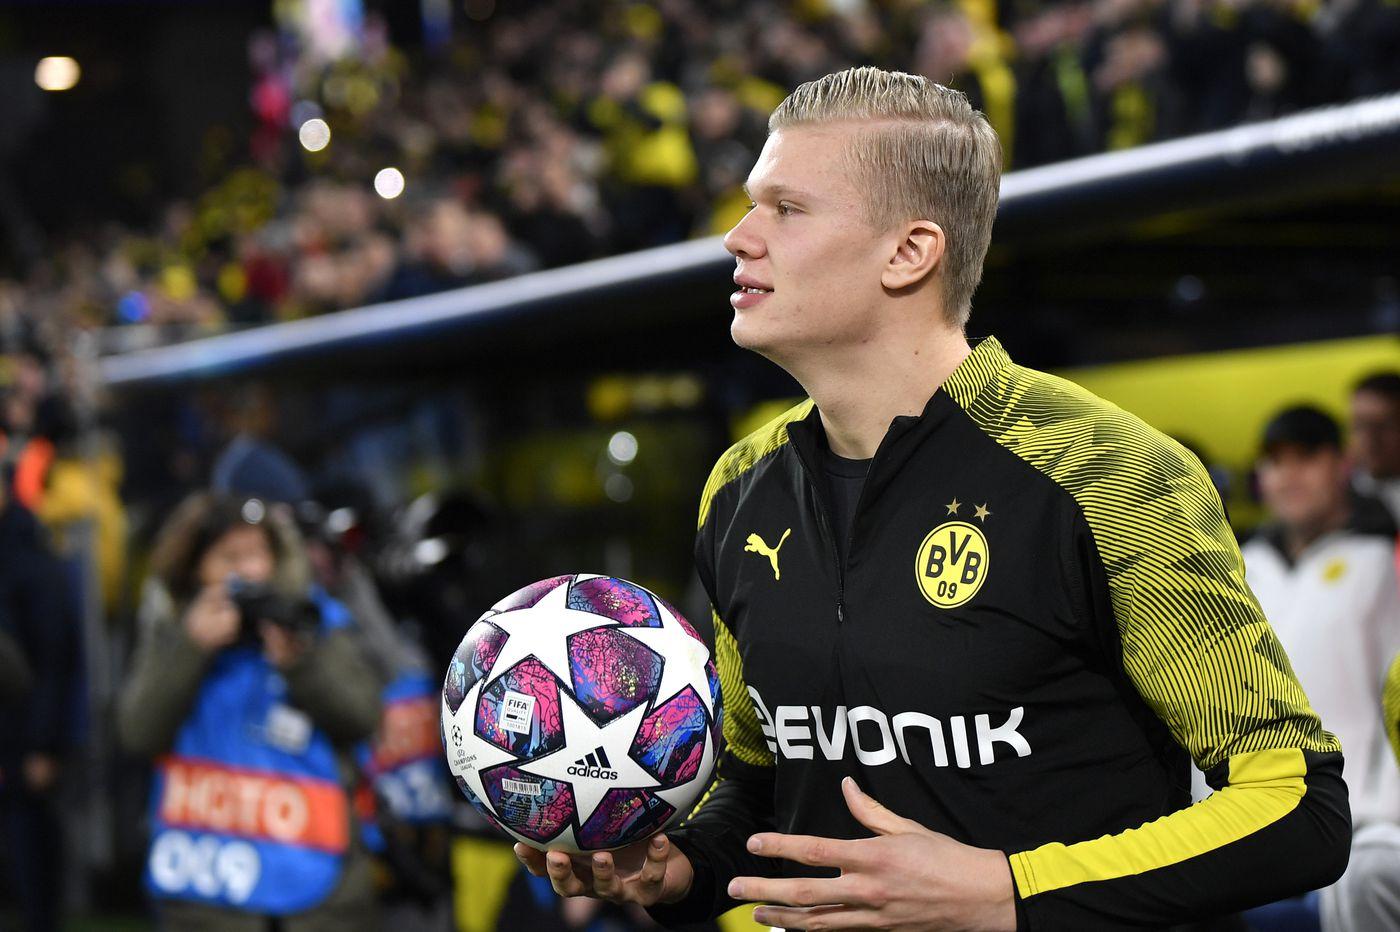 Soccer games to watch: Premier League, Champions League, Bundesliga